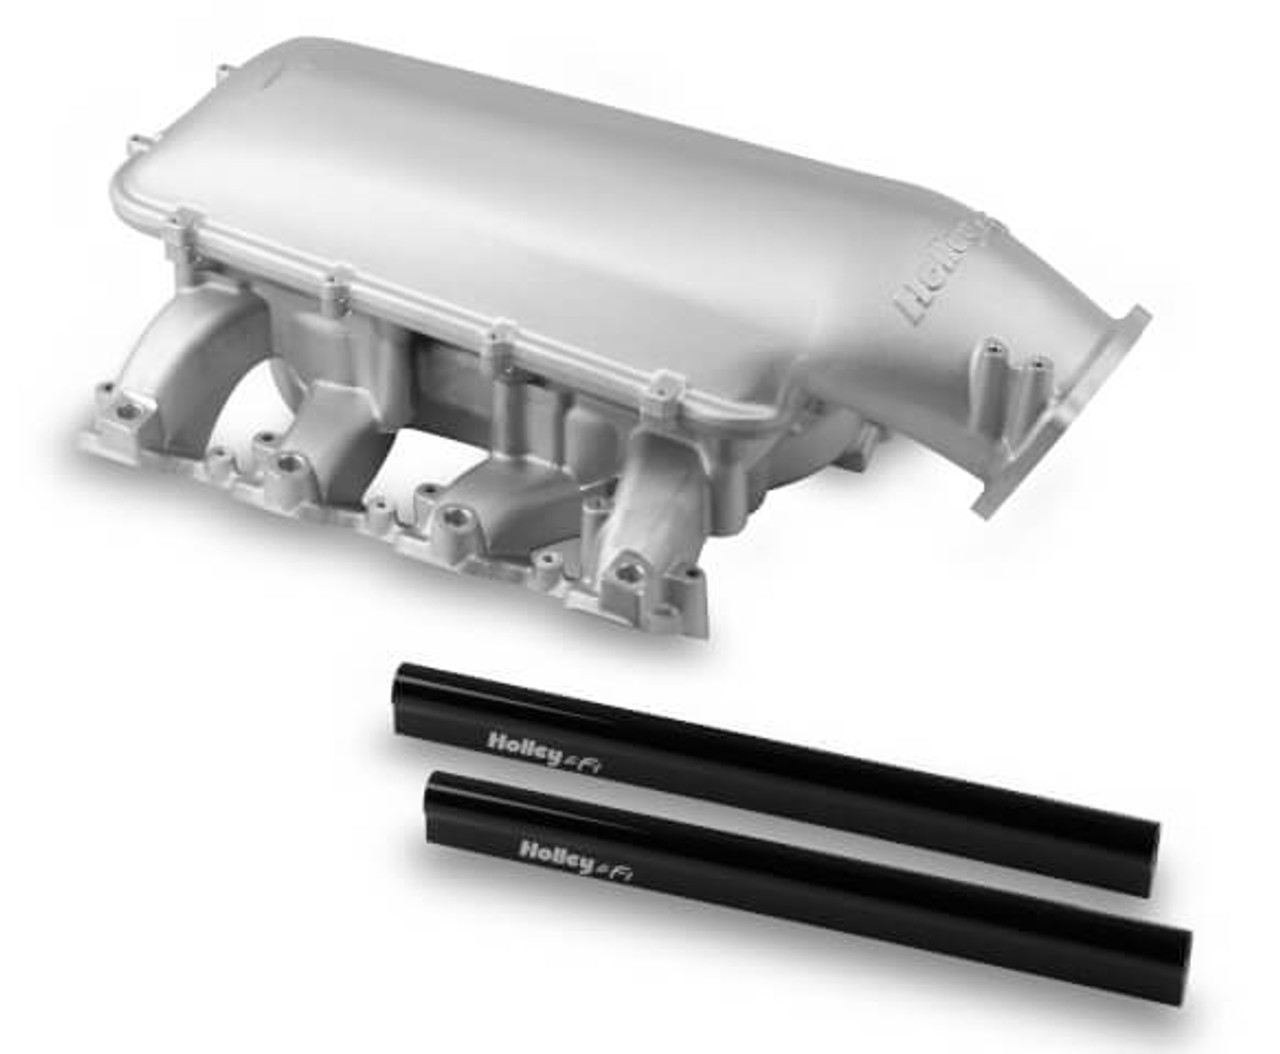 Holley Intake Manifold GM LS3 L92 Rectangular Port Heads 300-129 Dual Plane